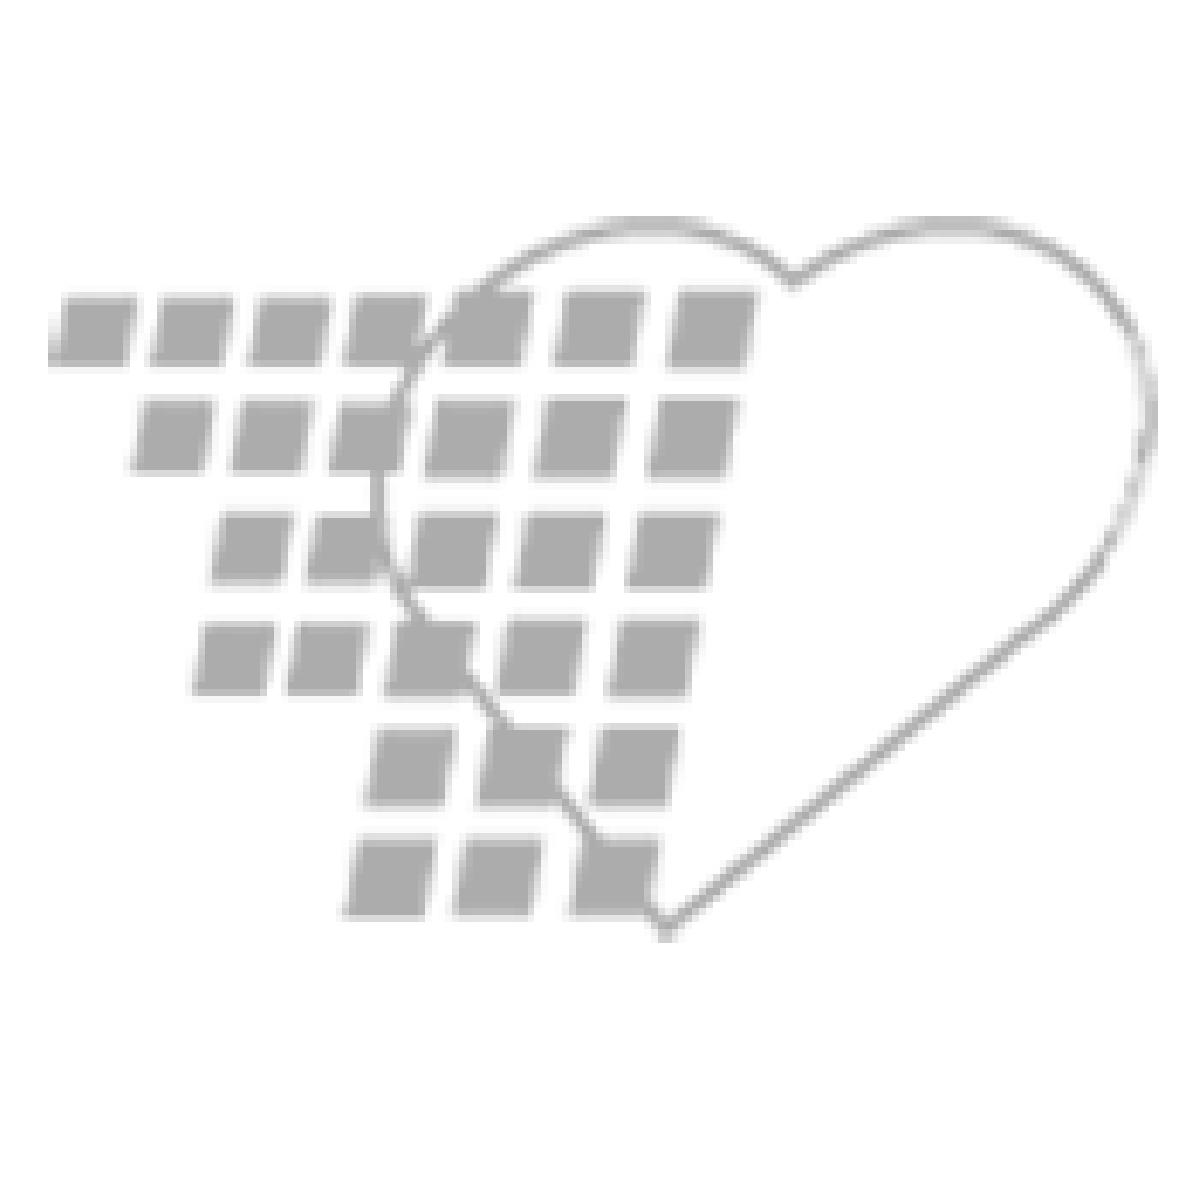 11-81-2220 Gaumard Clinical Chloe